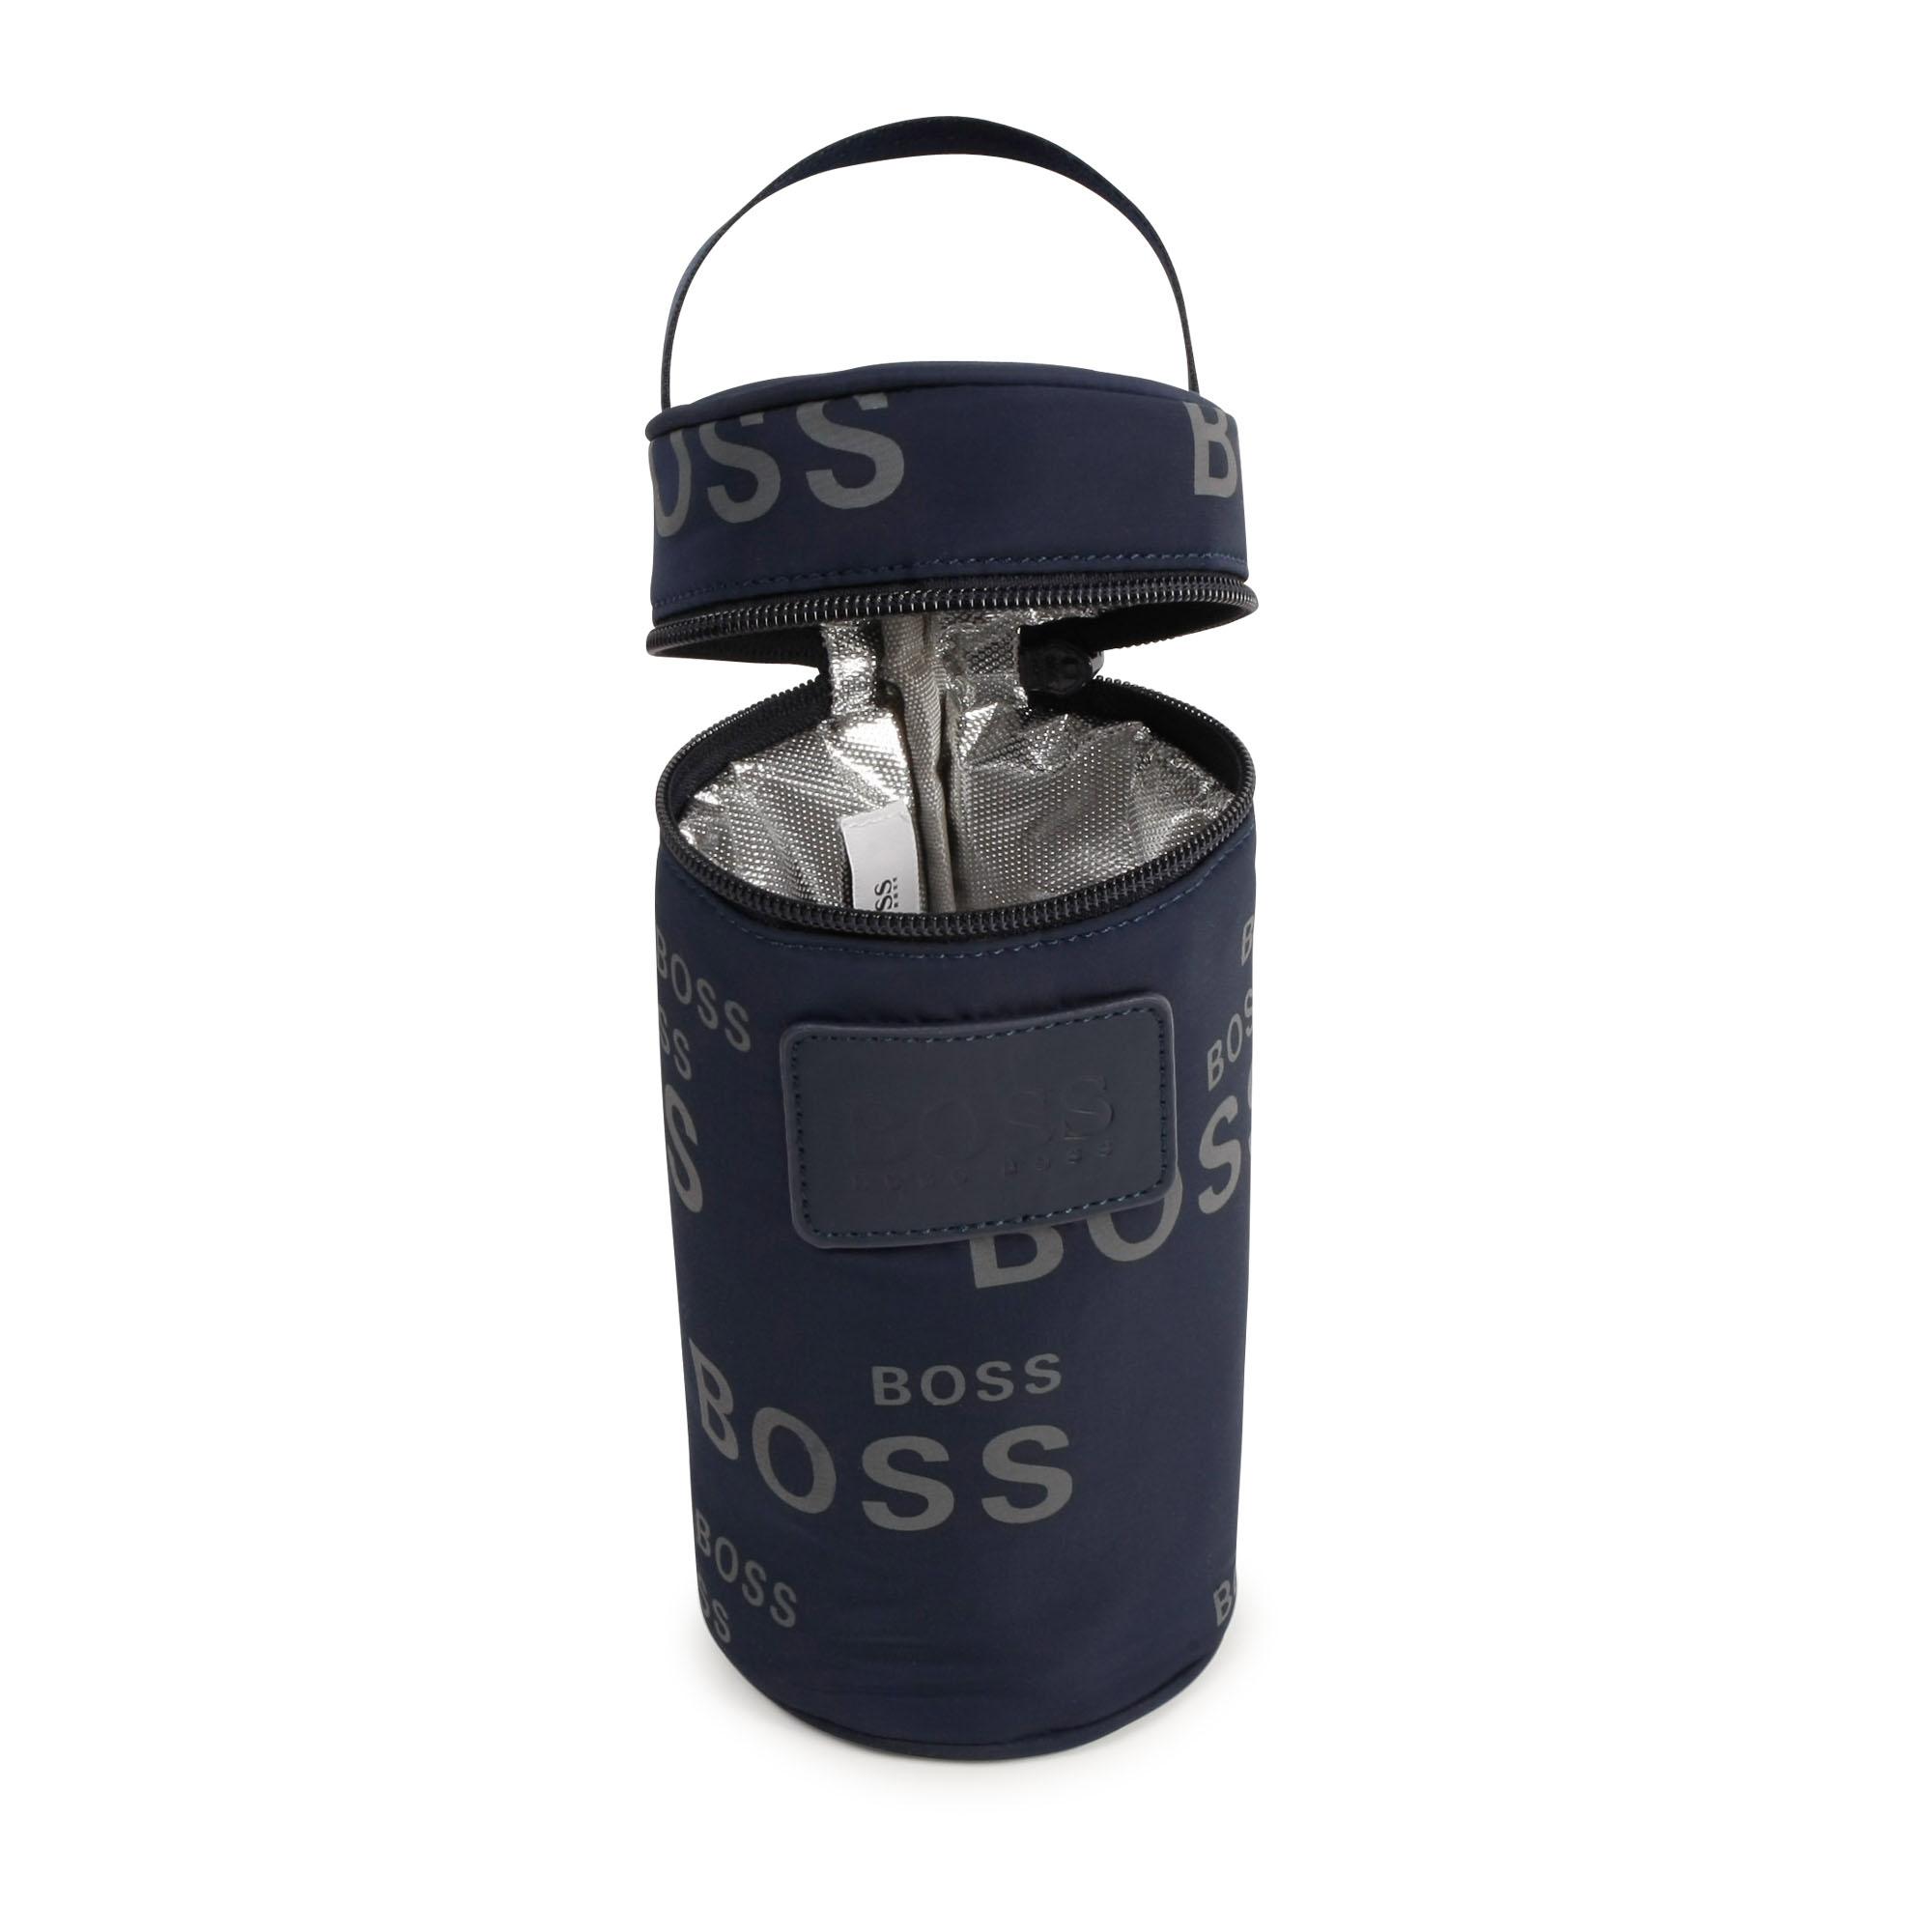 Porte-biberon en nylon BOSS pour UNISEXE